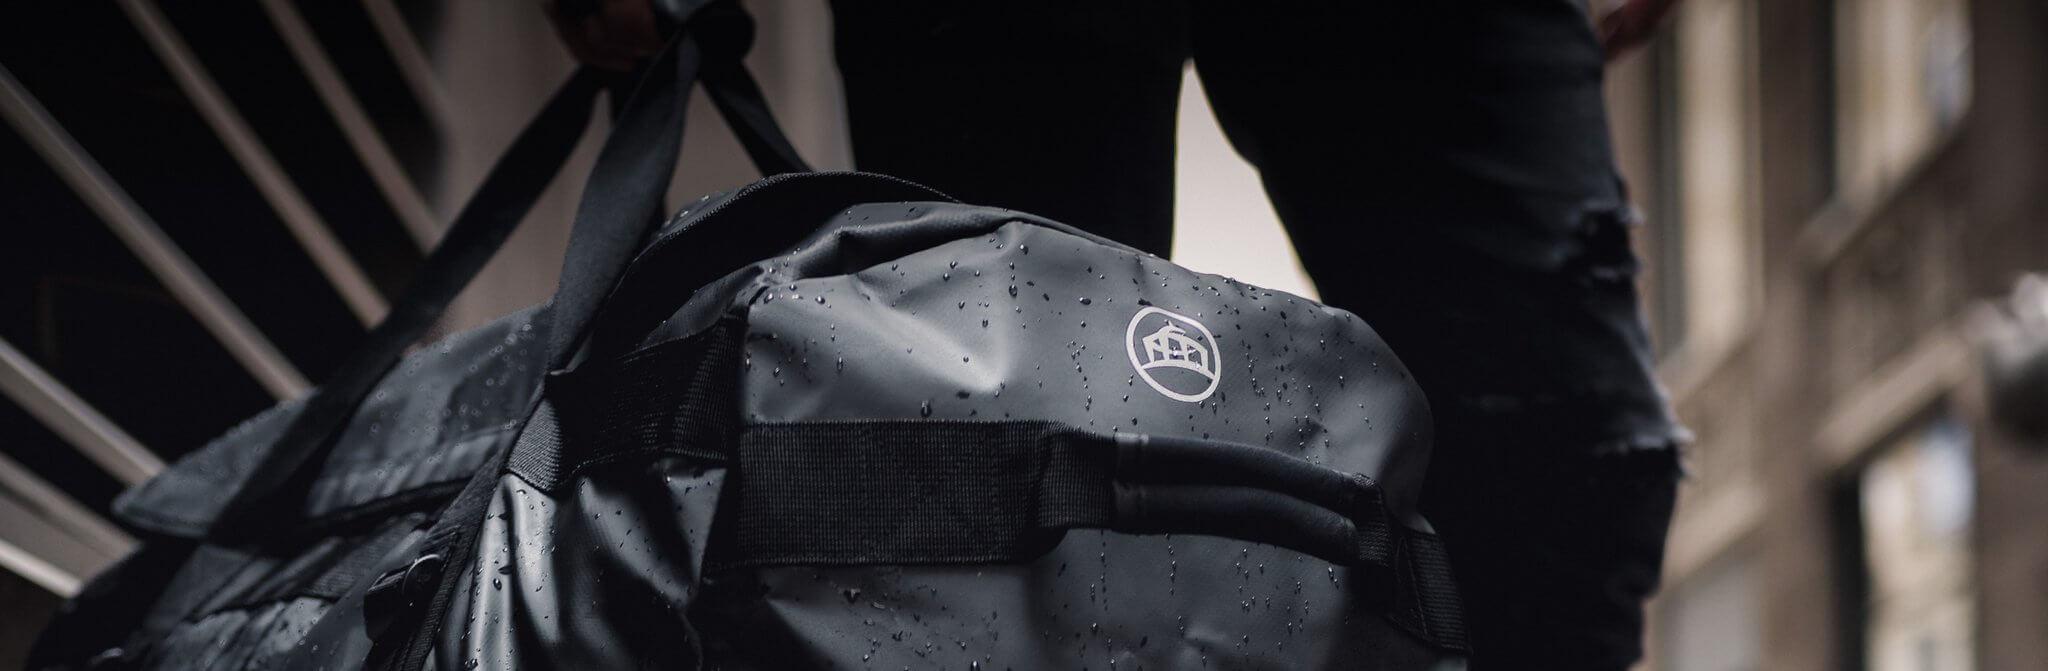 promotional bags.jpg